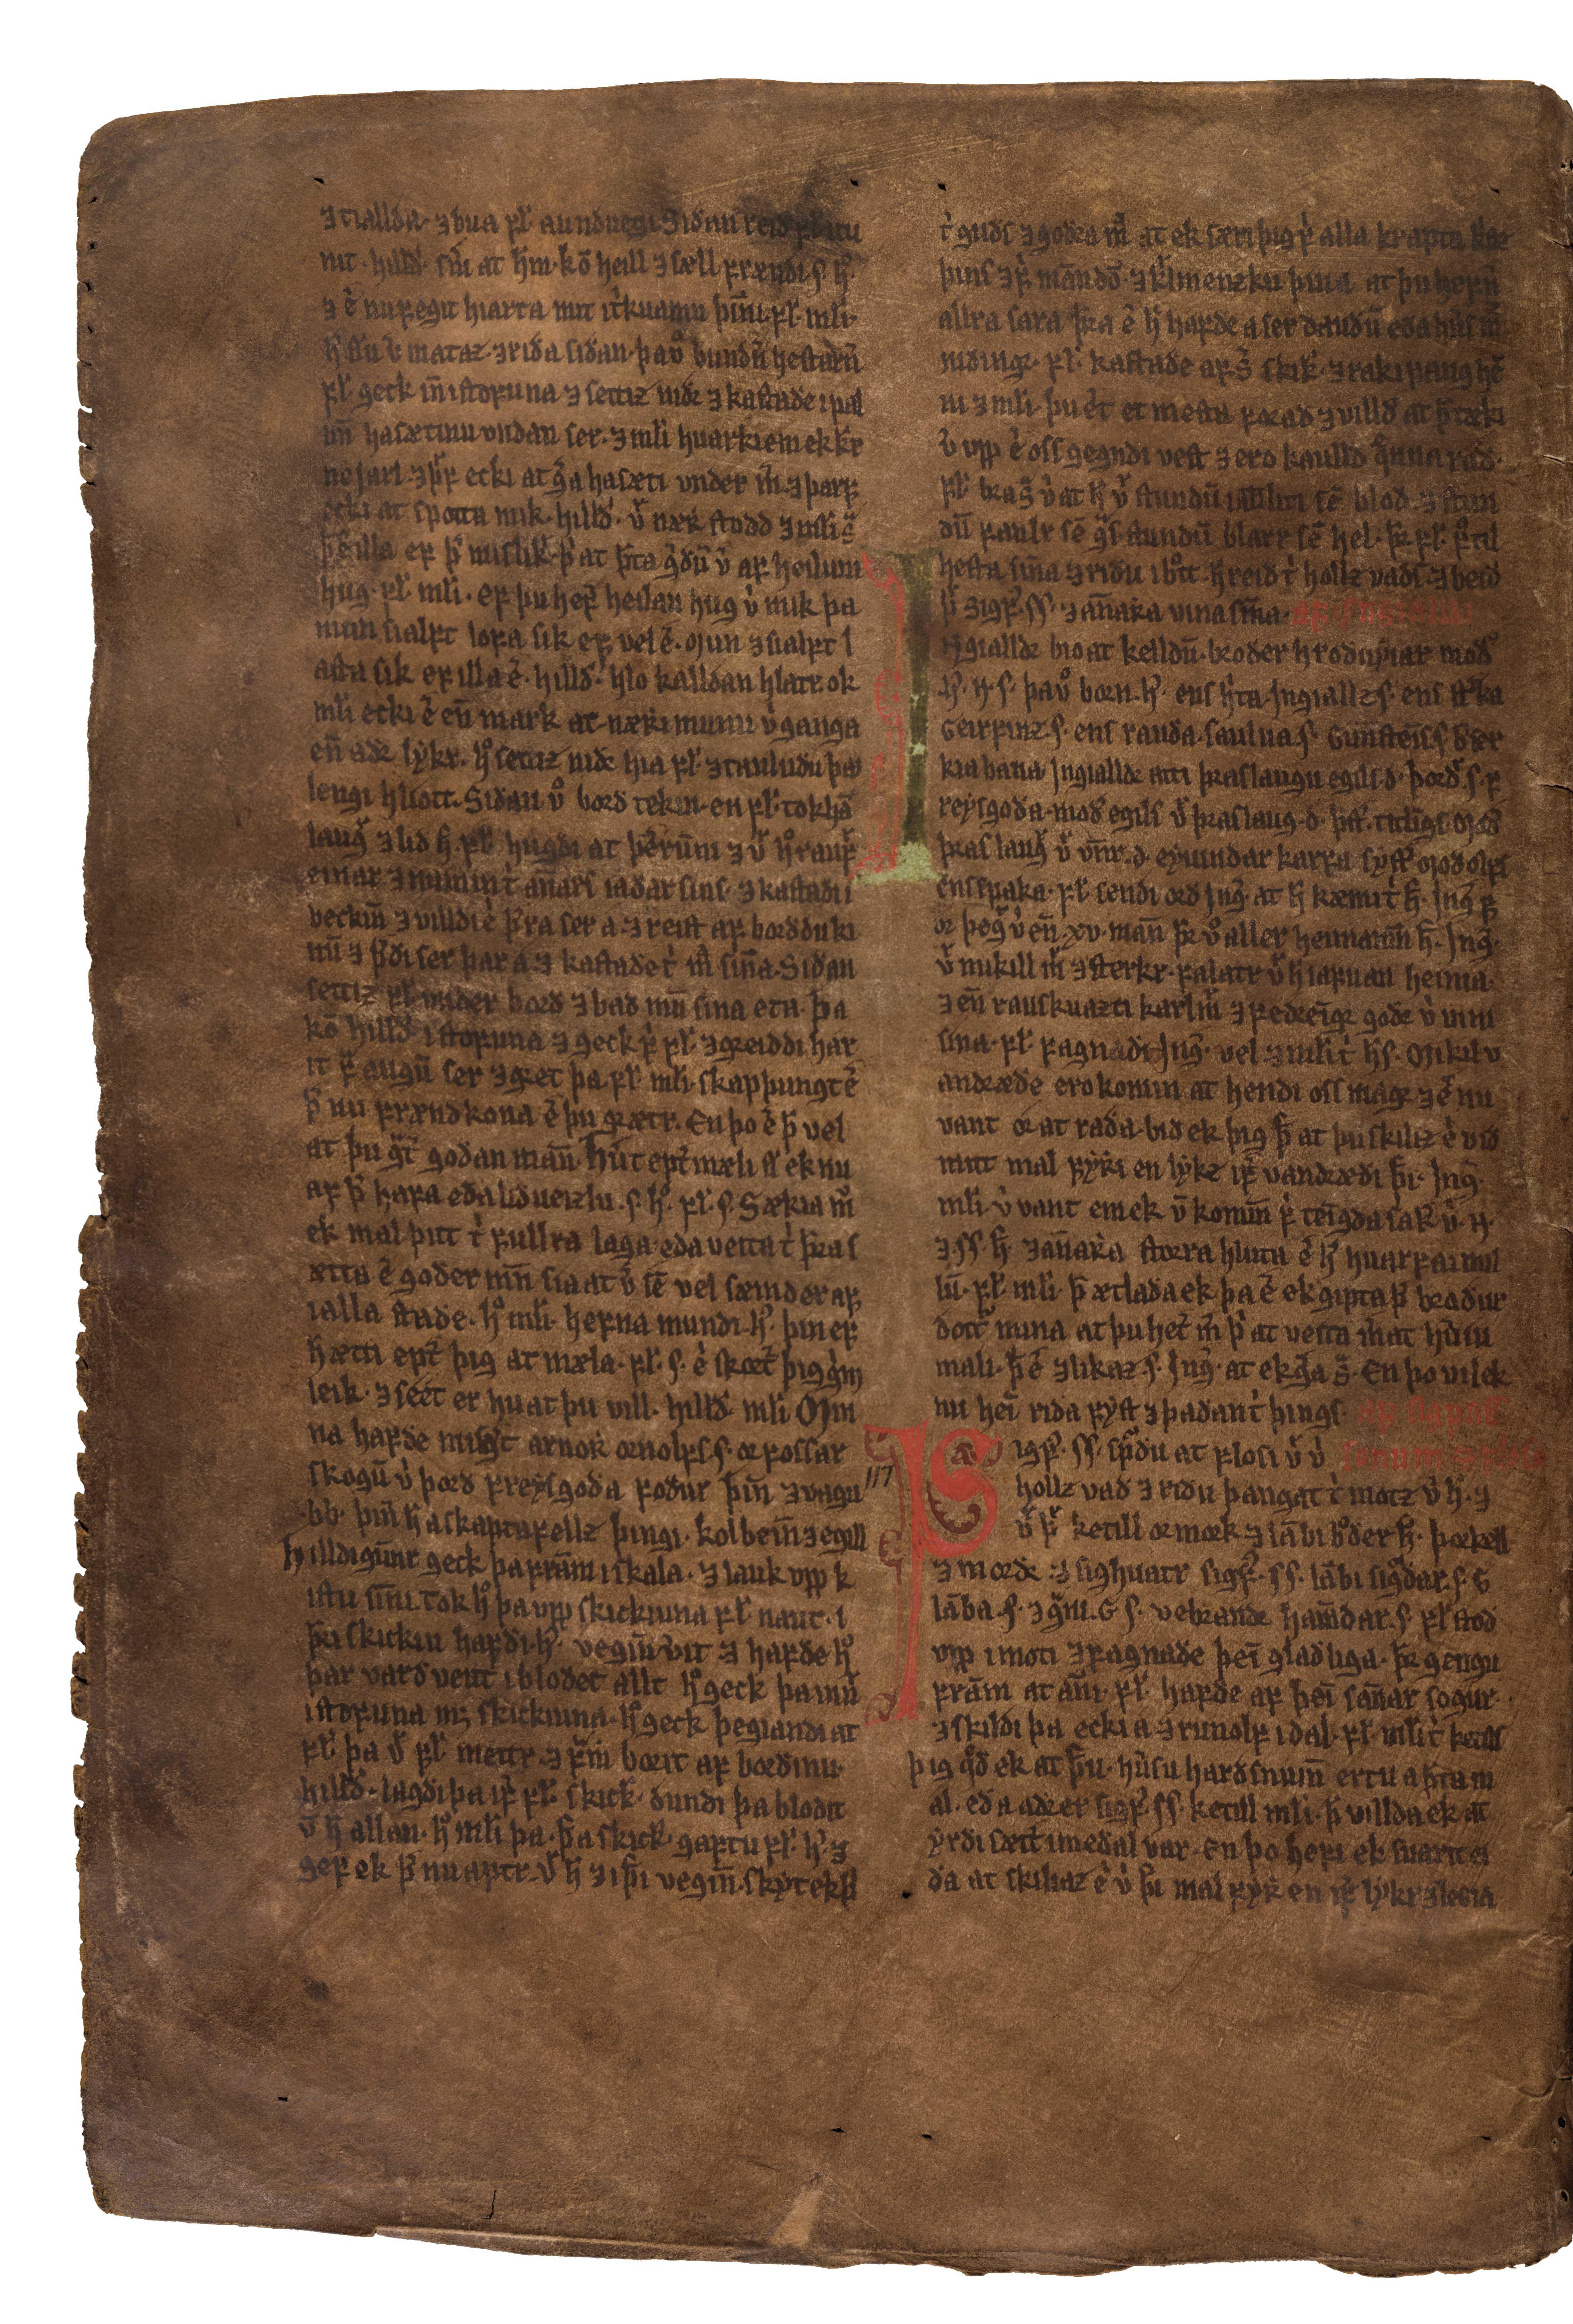 AM 132 fol - 40v